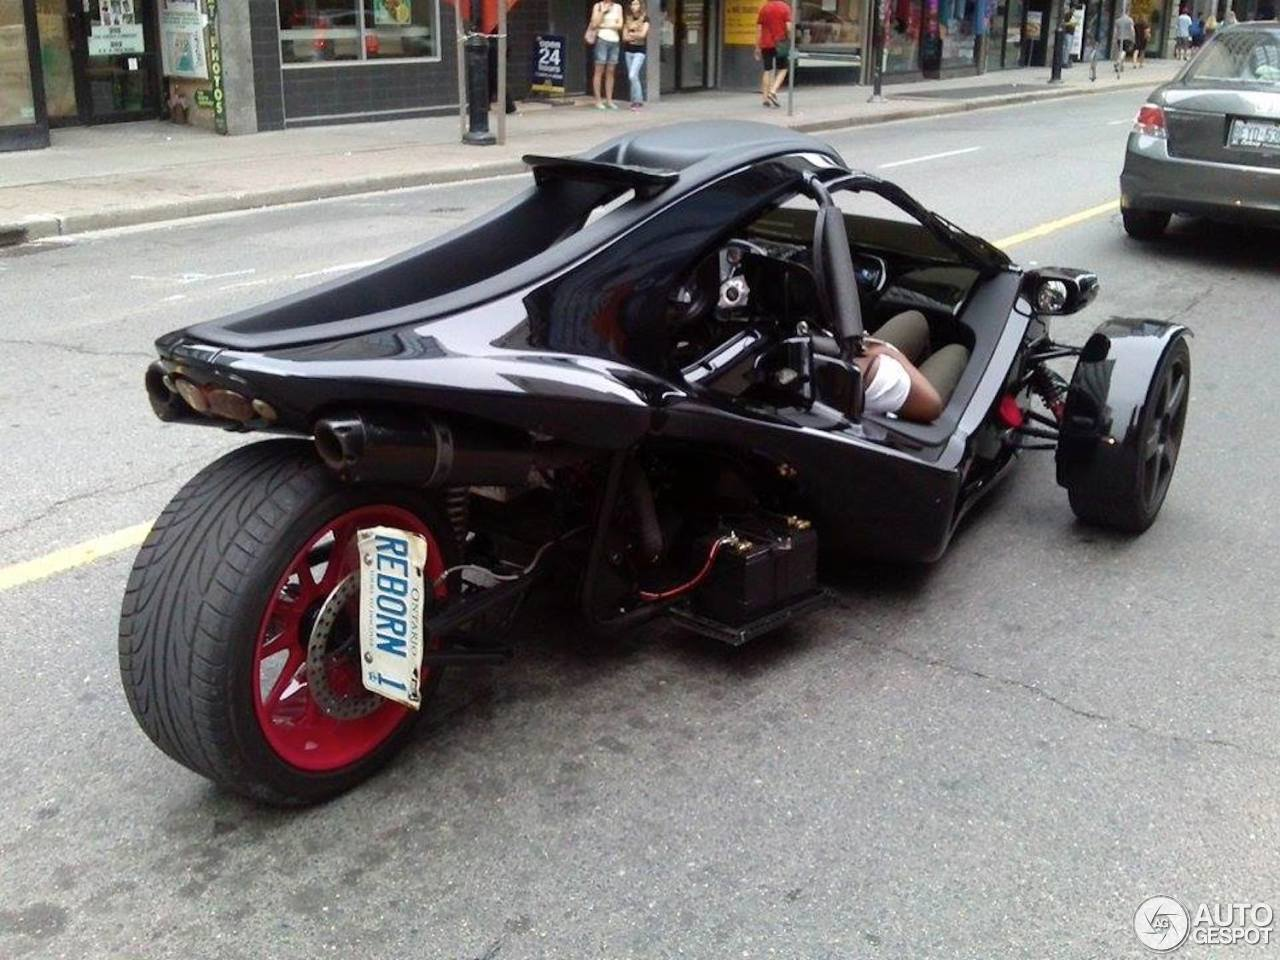 Campagna t rex 4 august 2014 autogespot for T rex motor vehicle